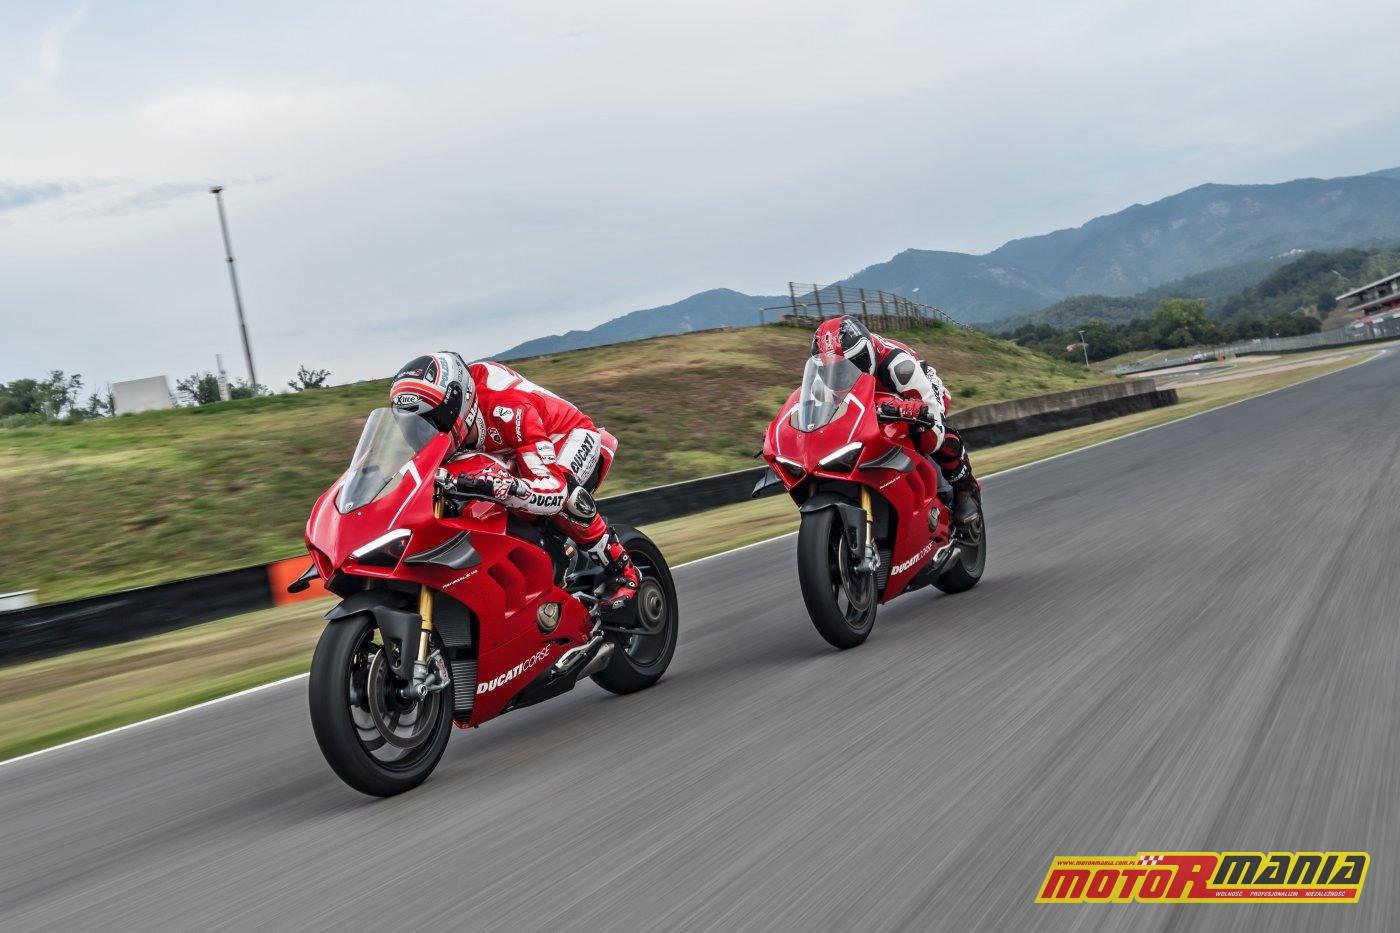 Ducati Panigale V4 R 2019 (14)